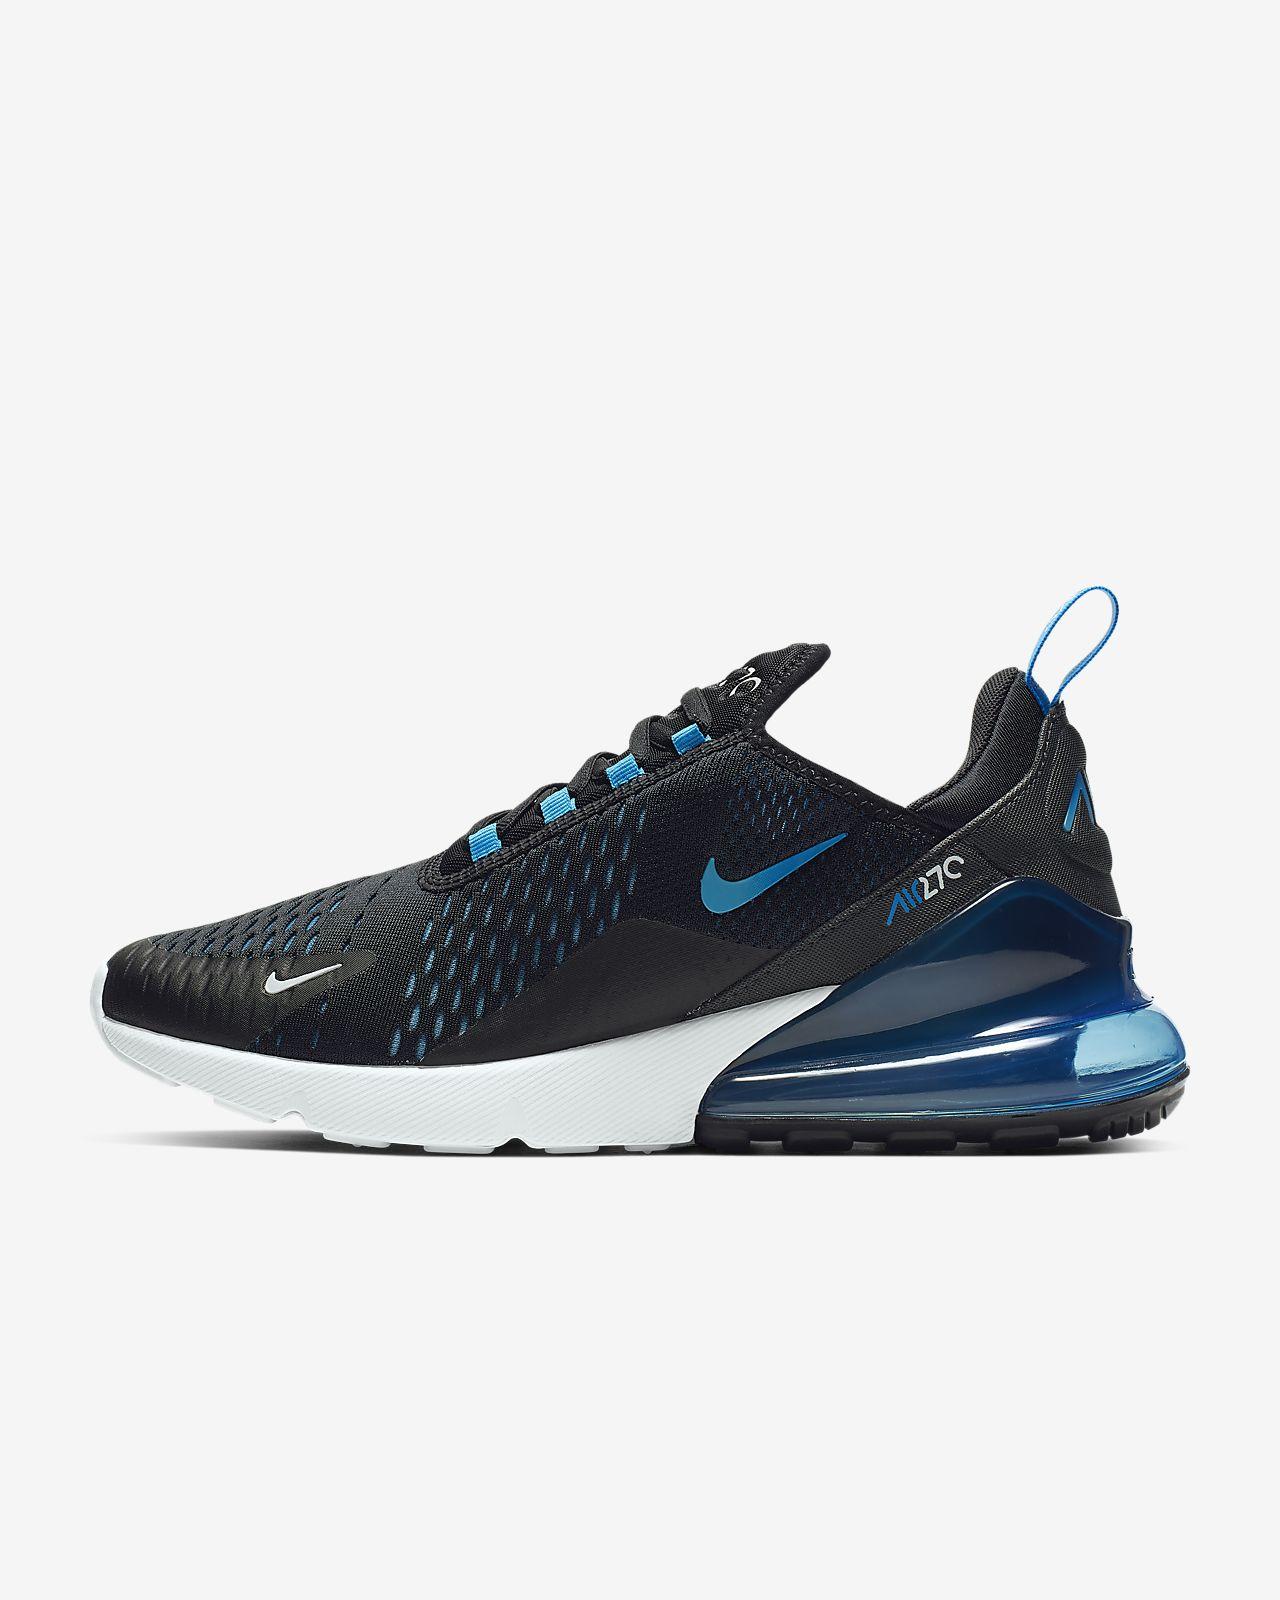 timeless design c3353 a7da7 ... Nike Air Max 270 férficipő